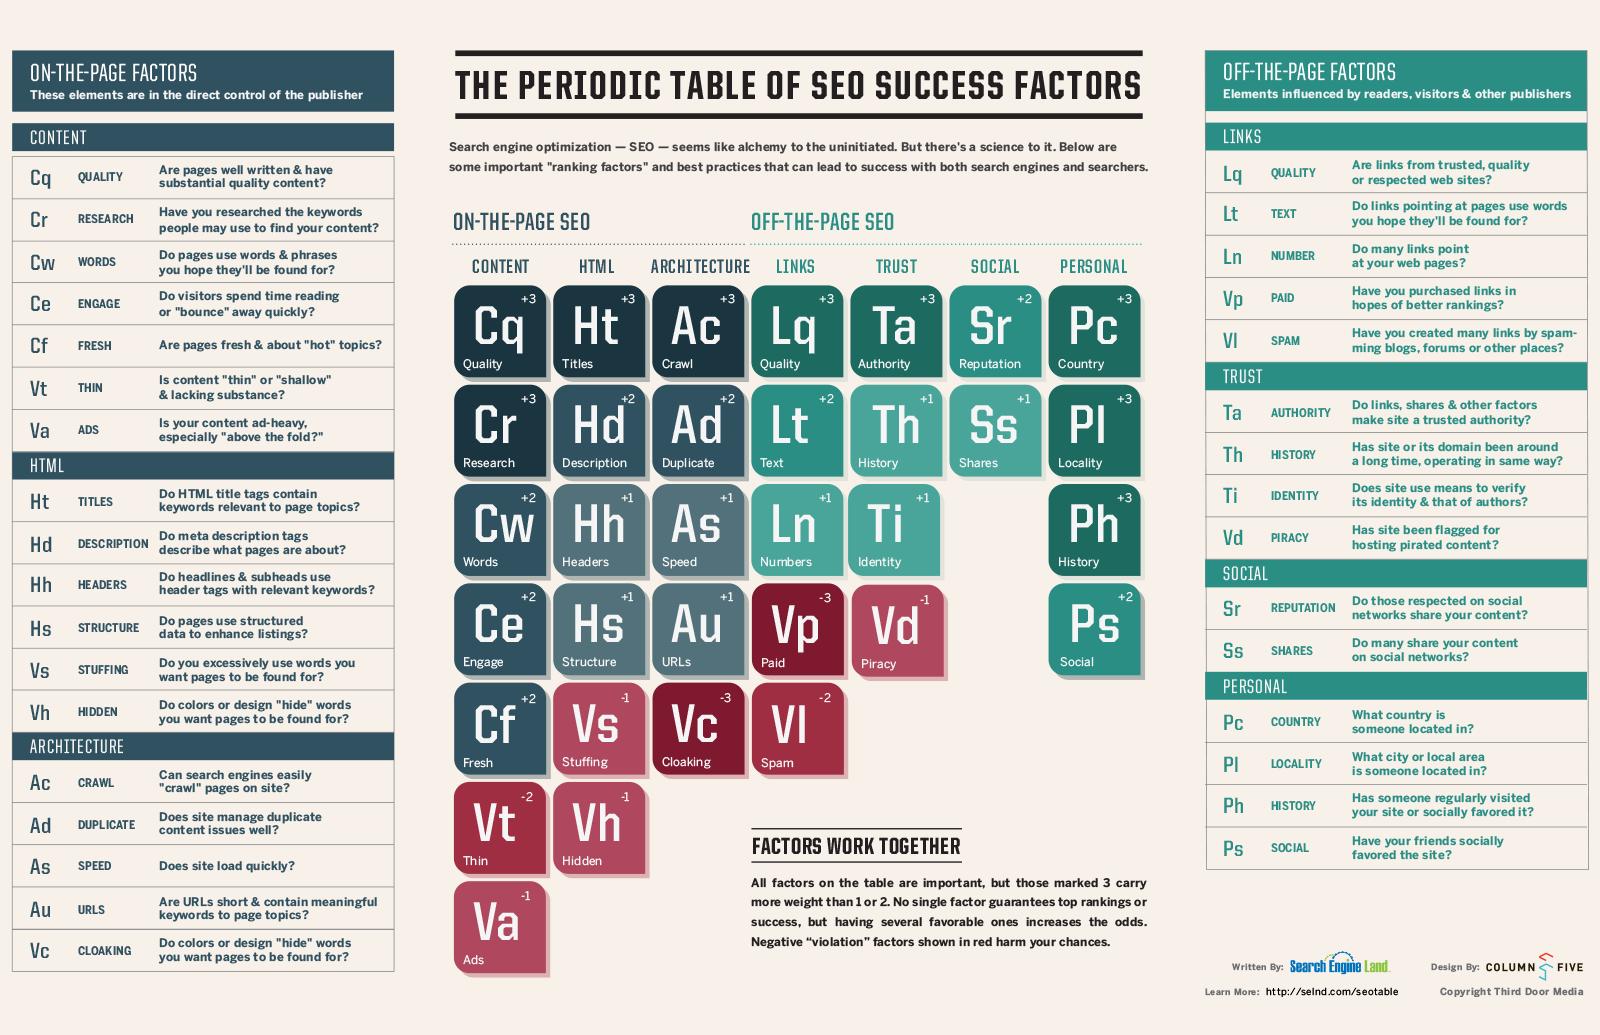 The Periodic Table of SEO Success Factors